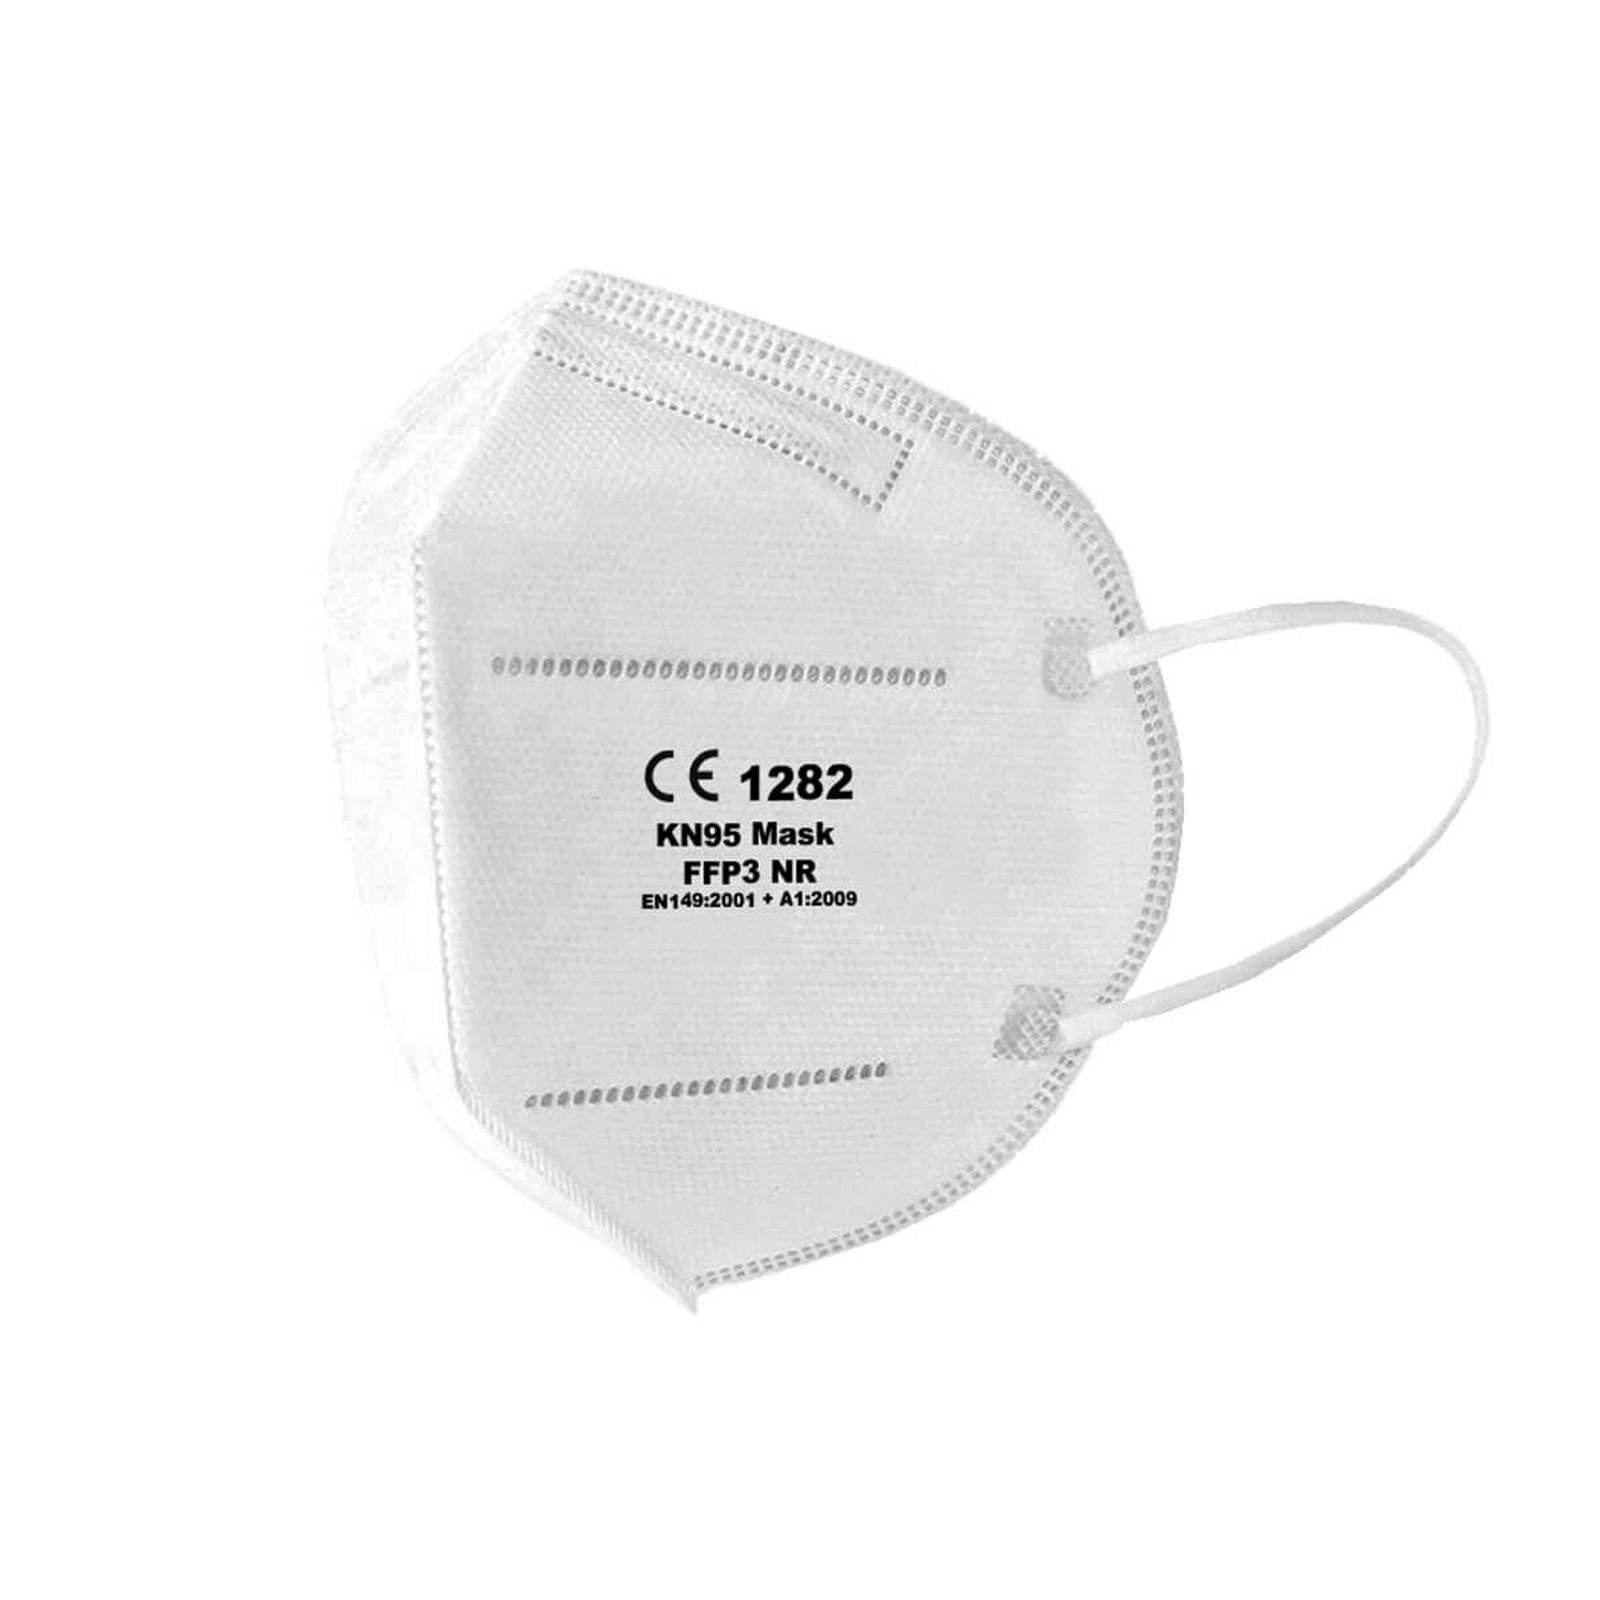 FFP3 Filtering Particulate Respirator